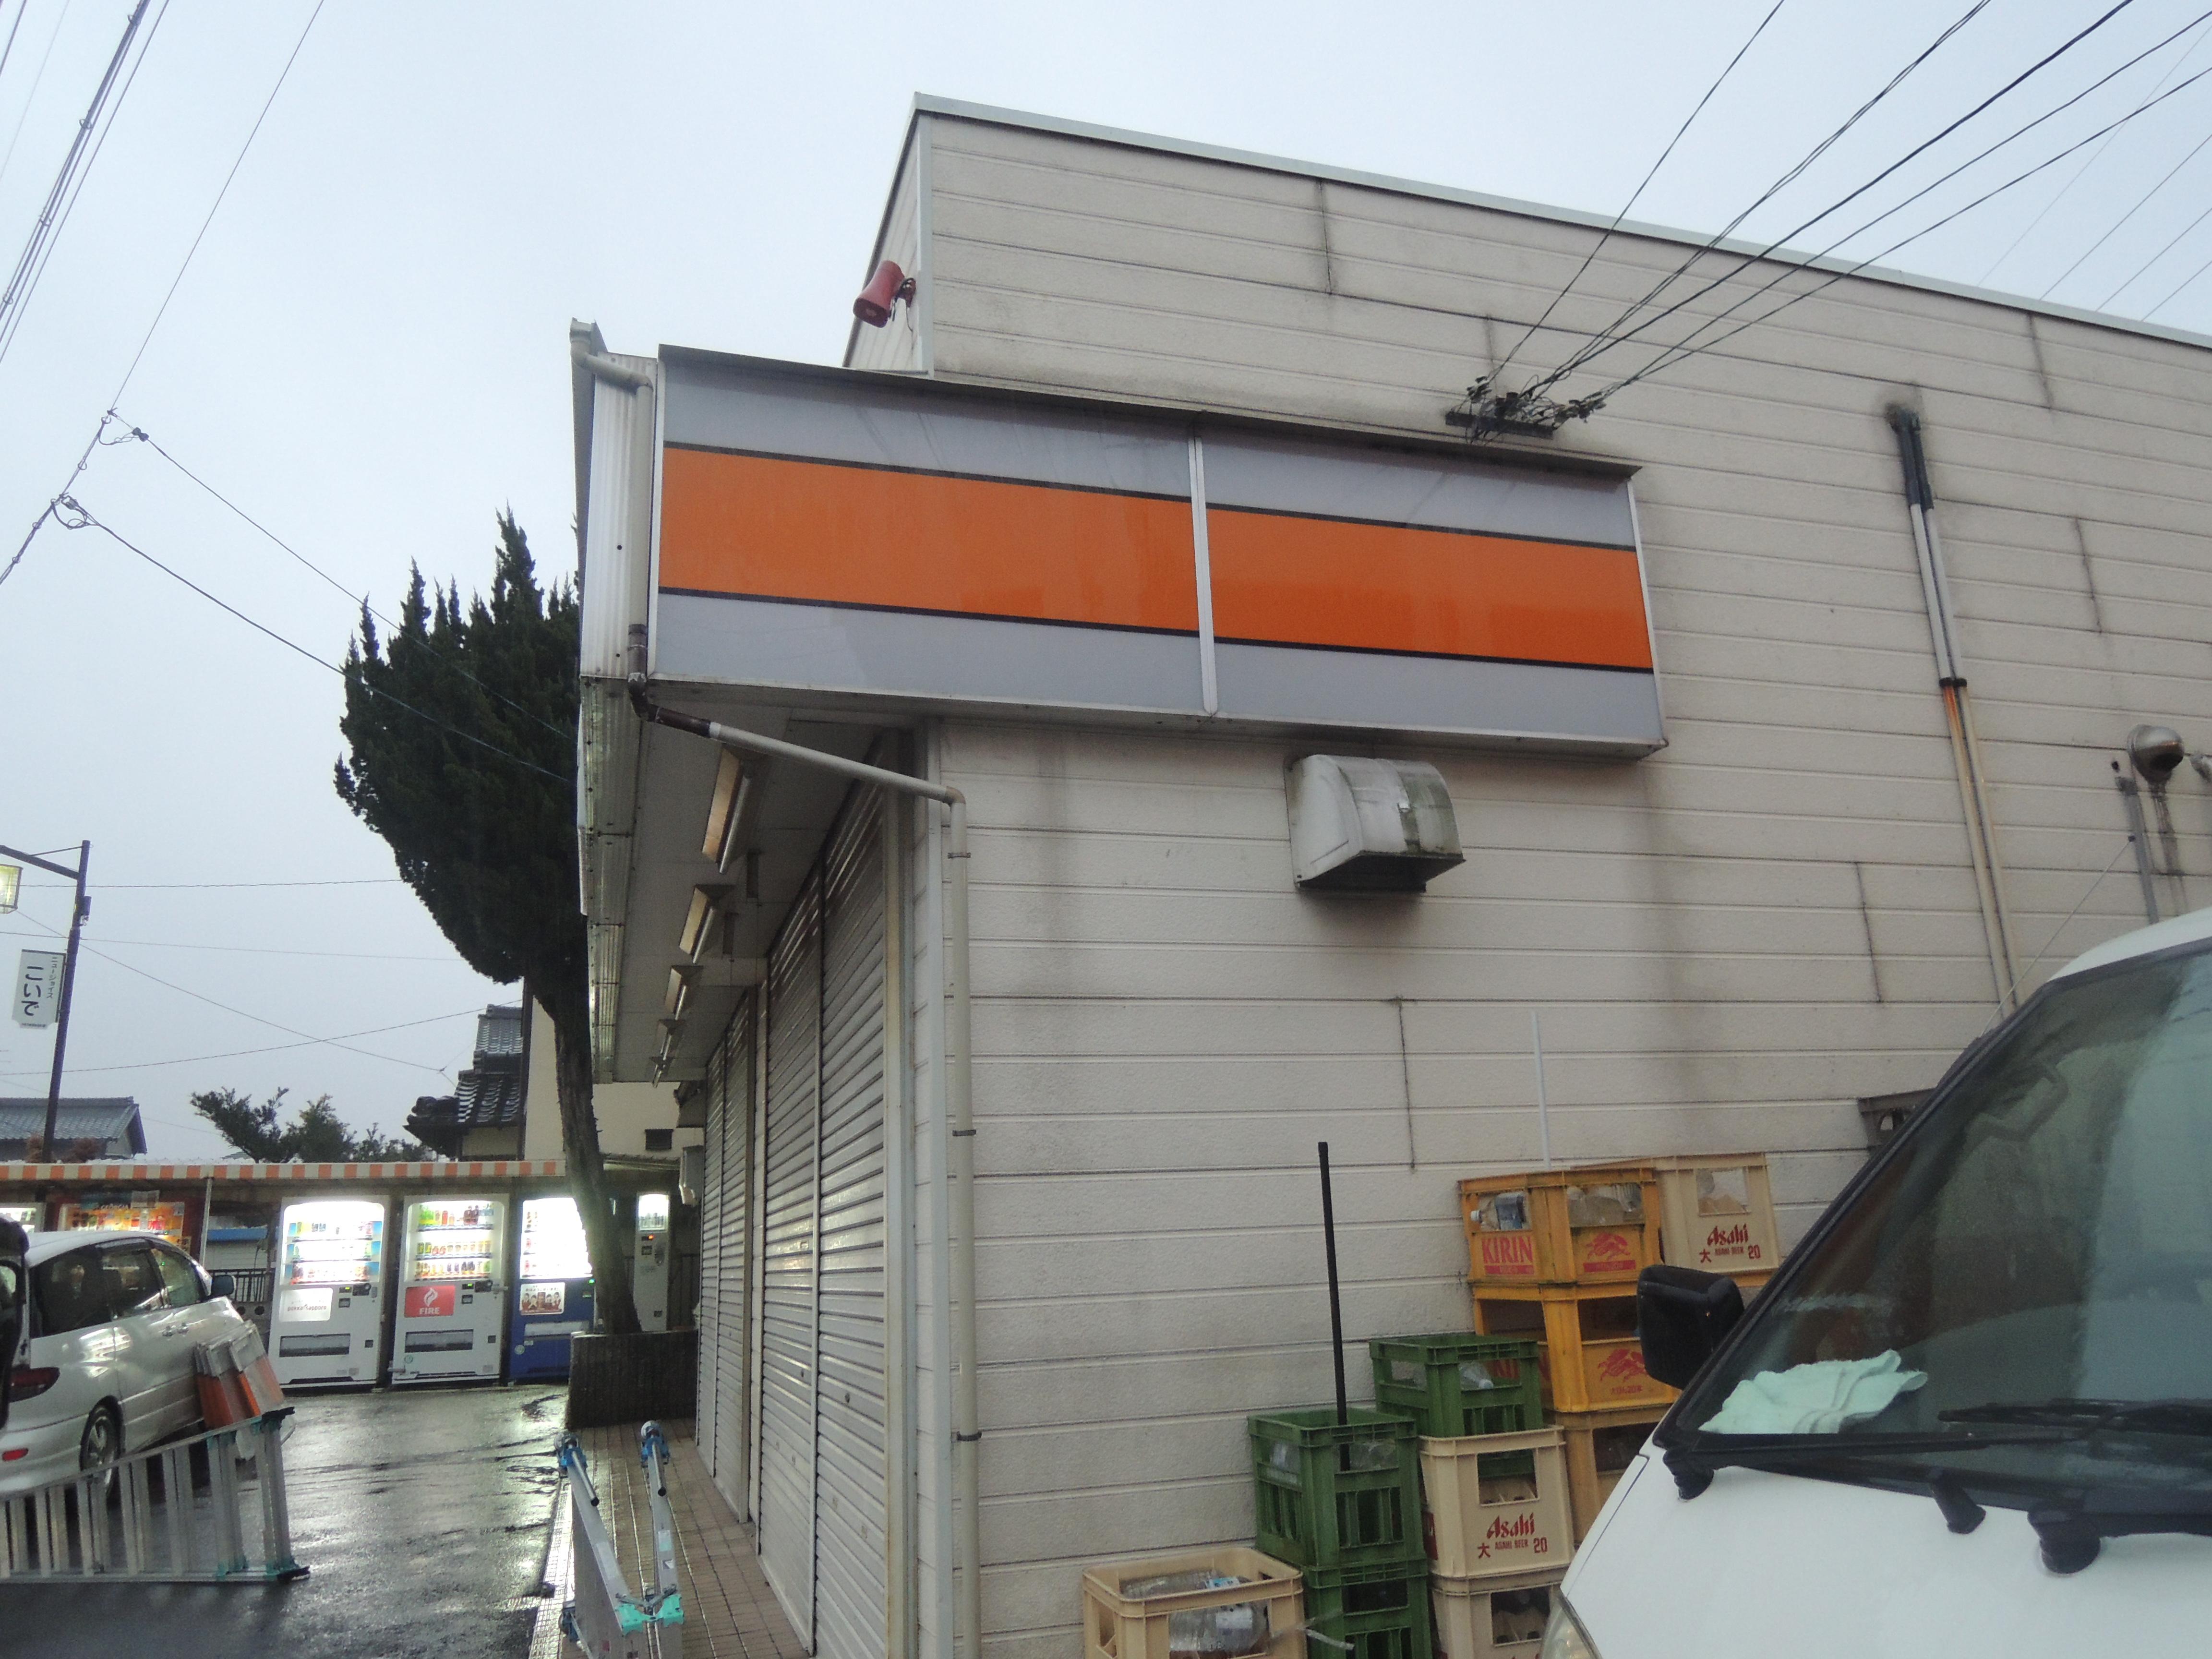 DSCN2545 - 小売店舗。古くなった看板の取り替え作業を担当させて頂きました。